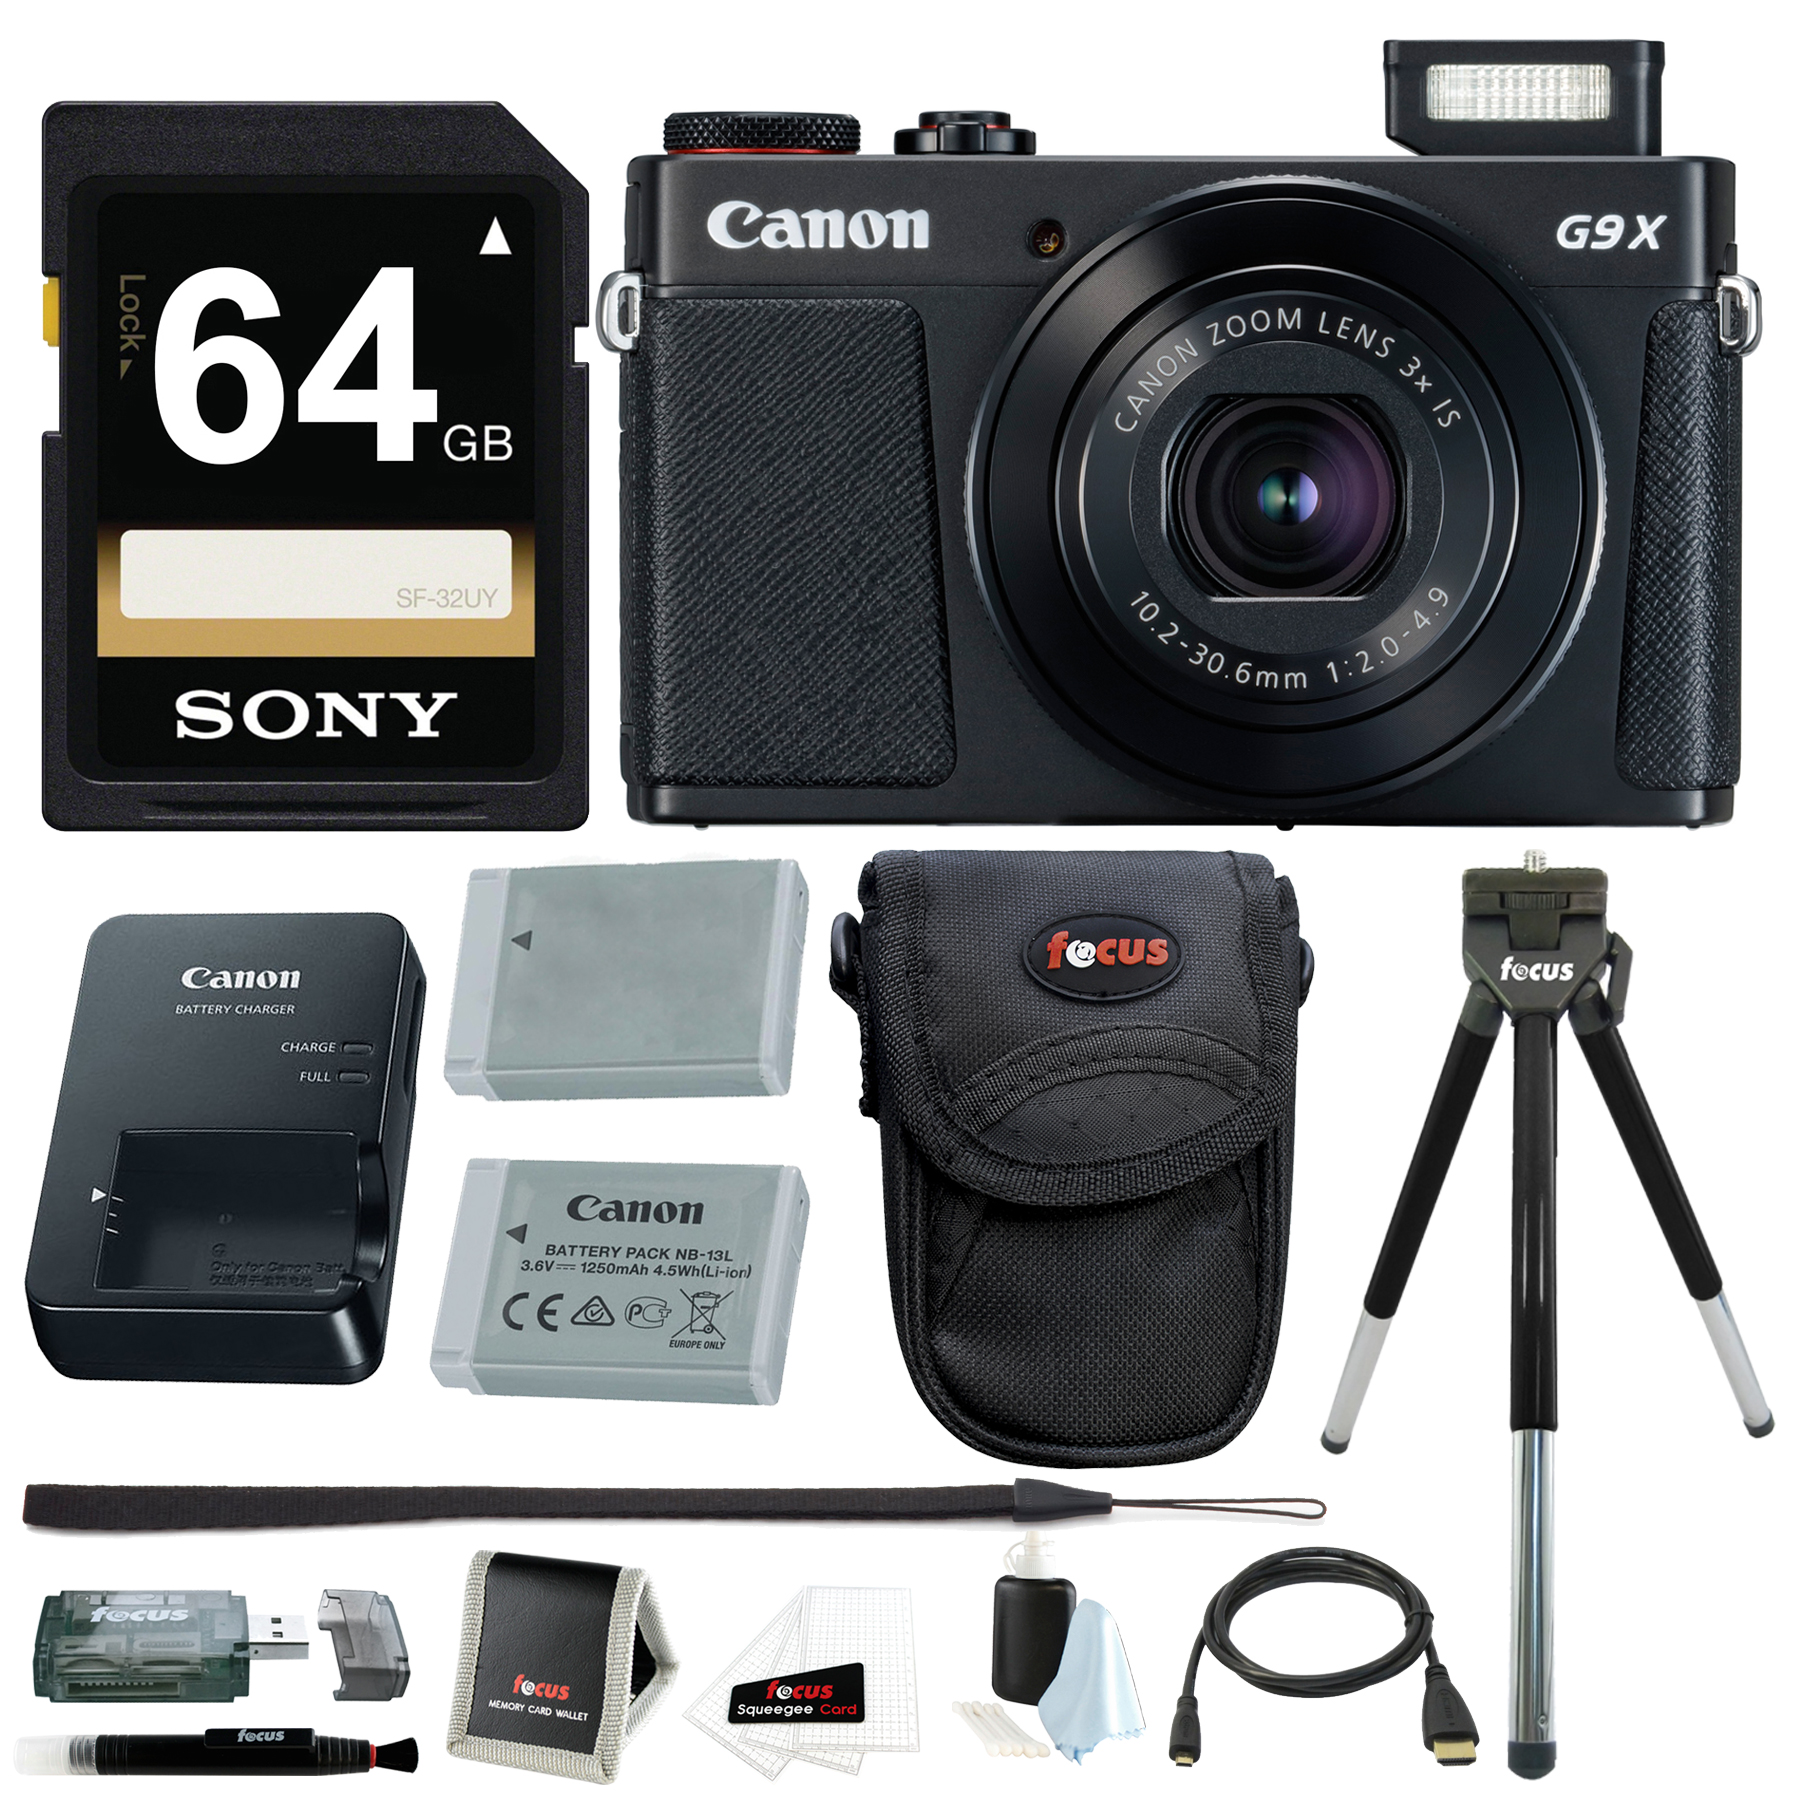 Canon Powershot G9 X Mark II Digital Camera with 64GB Car...